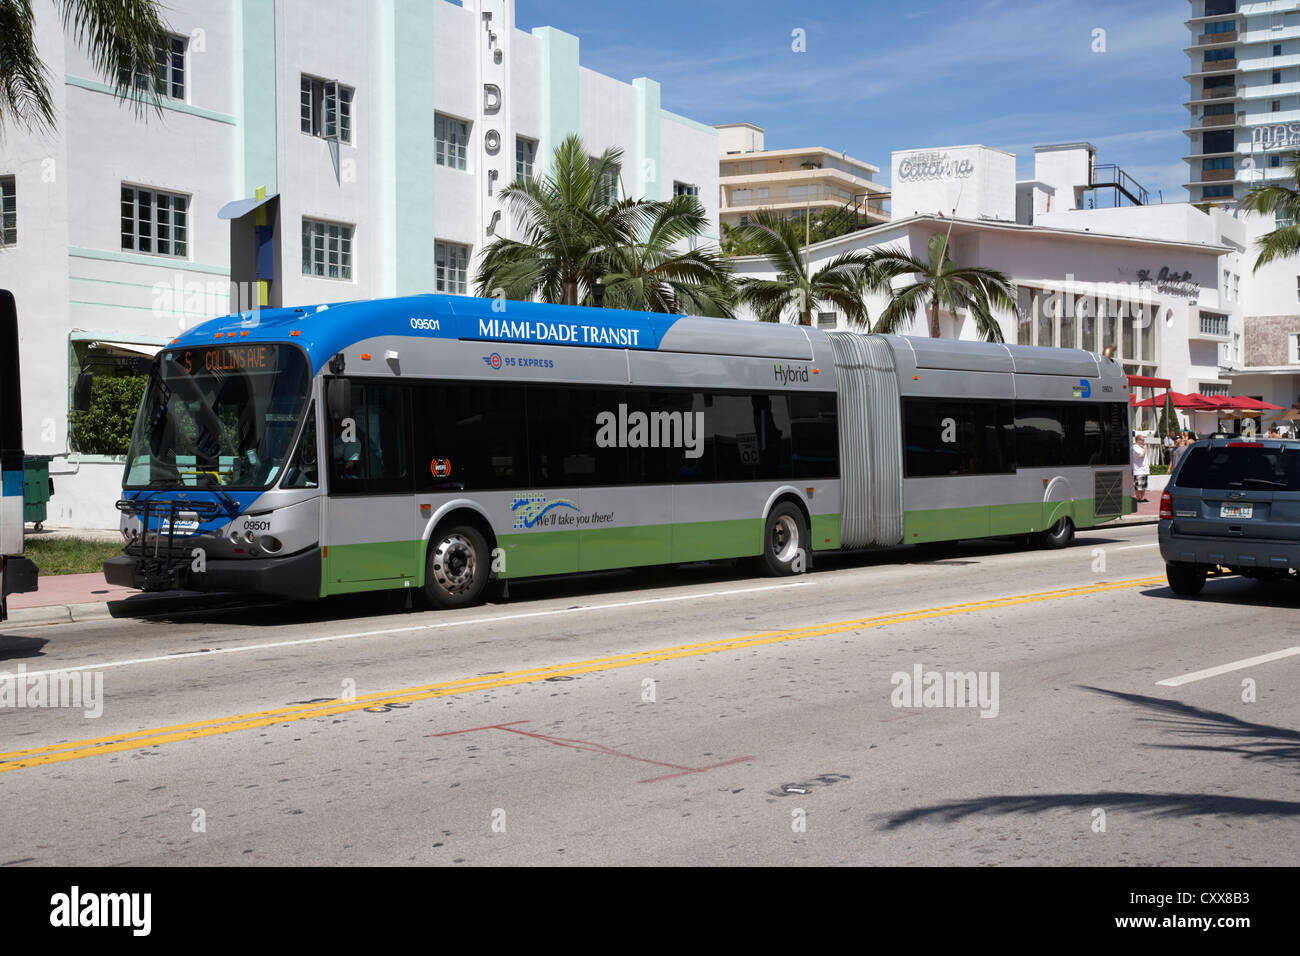 Miami-Dade Transit transport public par bus hybride Miami South beach floride usa Photo Stock